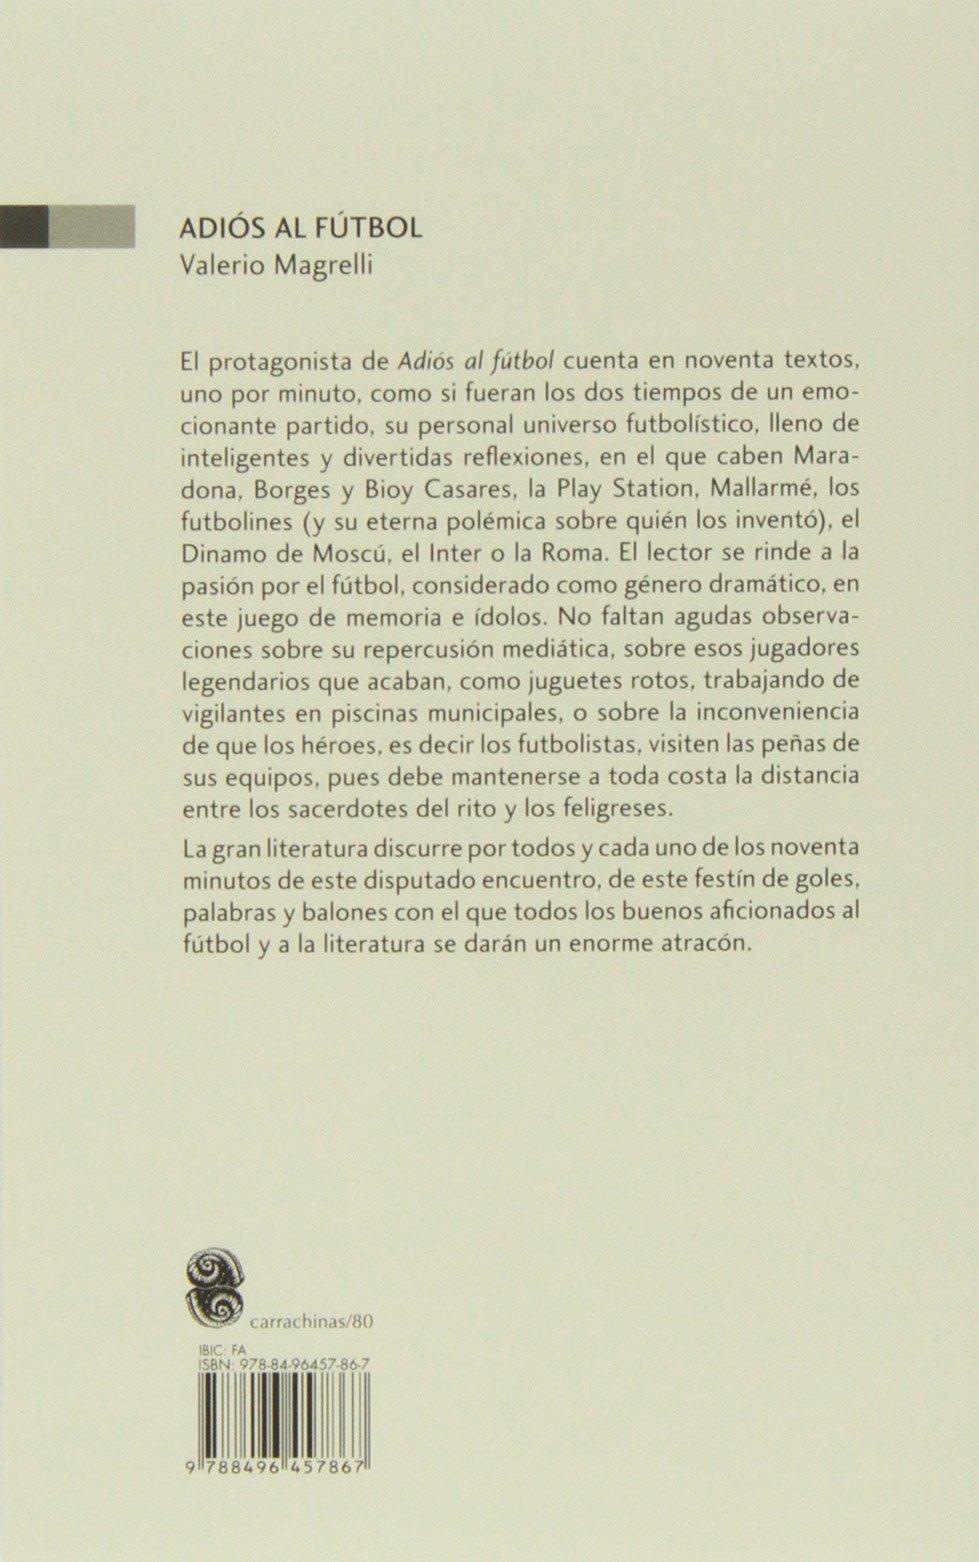 Adiós Al Fútbol (Carrachinas): Amazon.es: Magrelli, Valerio, Martínez de Pisón, Eduardo: Libros